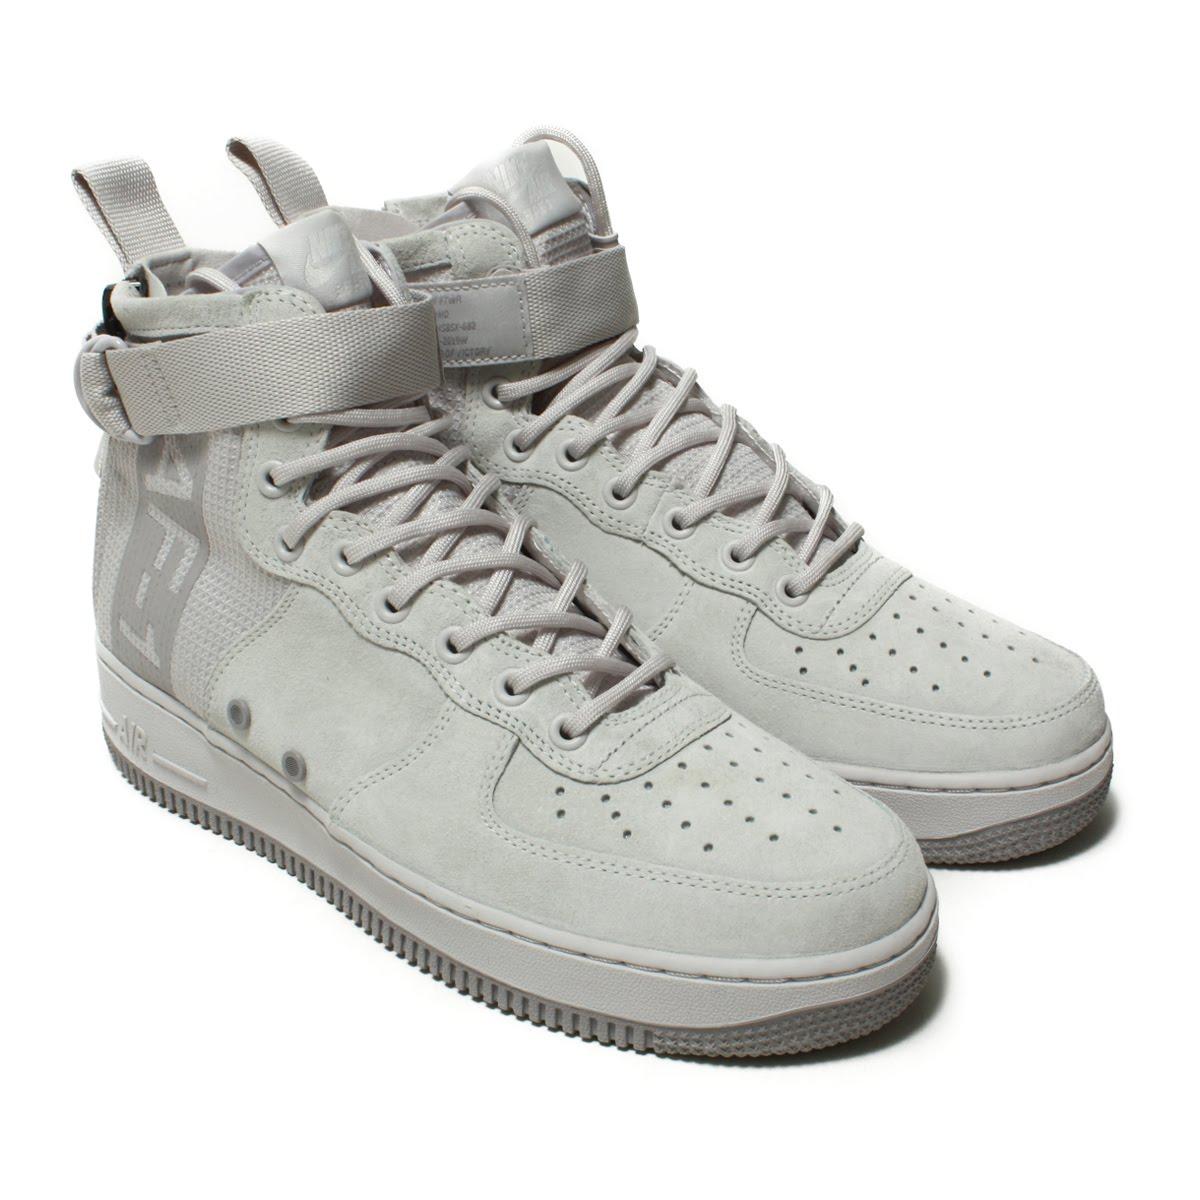 ★SALE ★ NIKE SF AF1 MID SUEDE (Nike SF AF 1 mid suede) VAST GREY/ATMOSPHERE  GREY 18SP-I